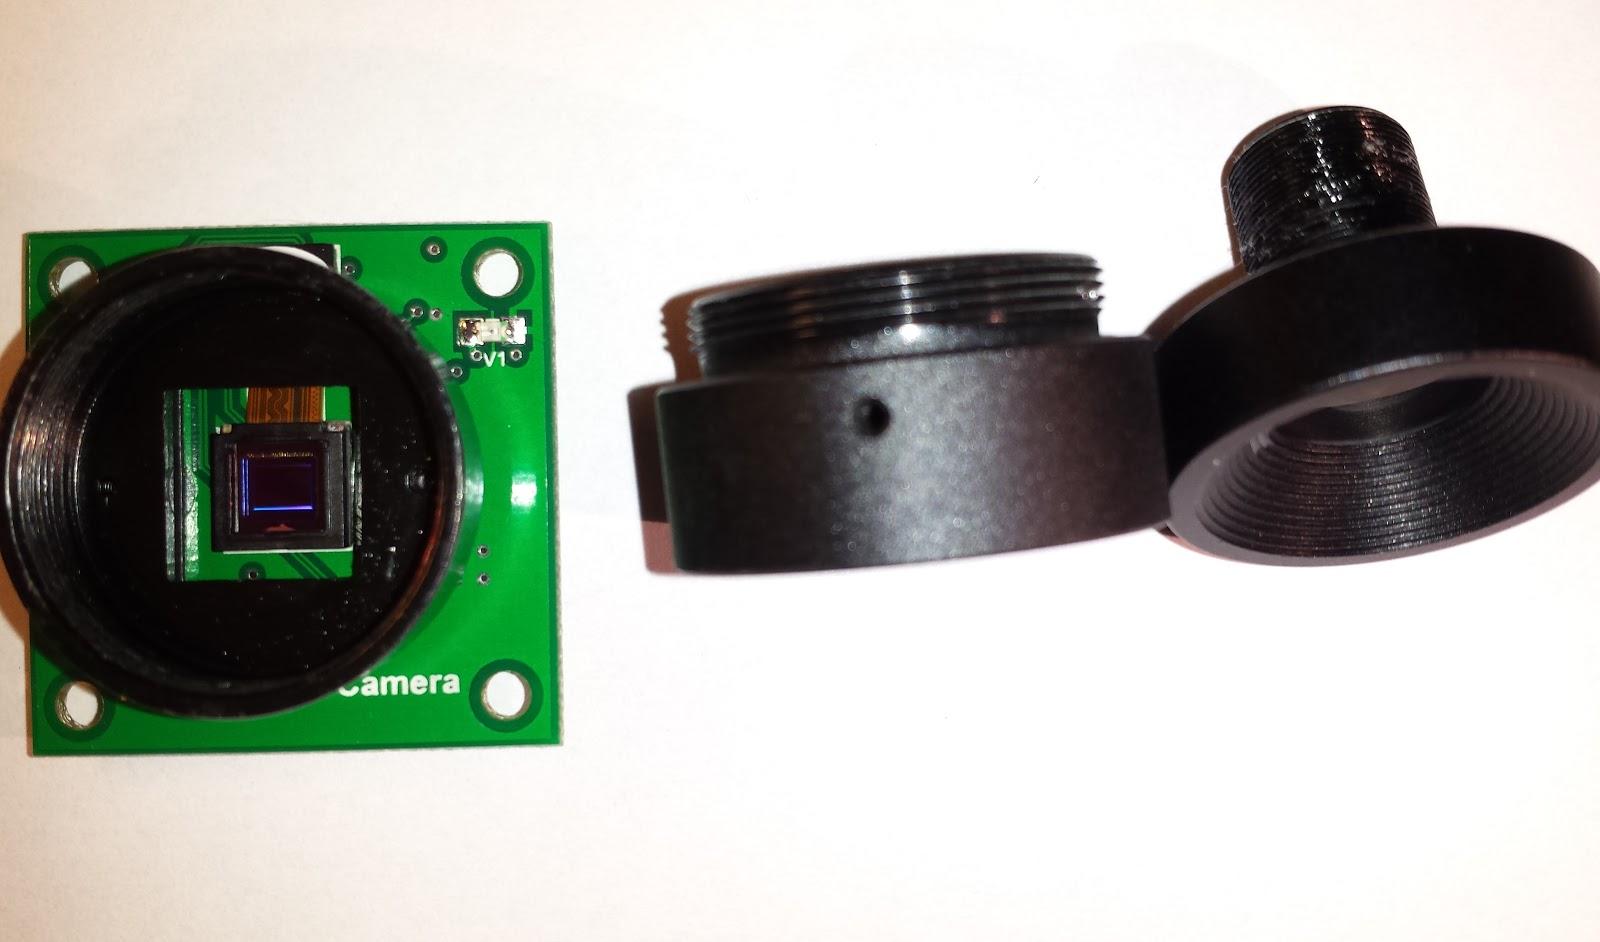 Mikroskopkamera odc odc kern sohn gmbh